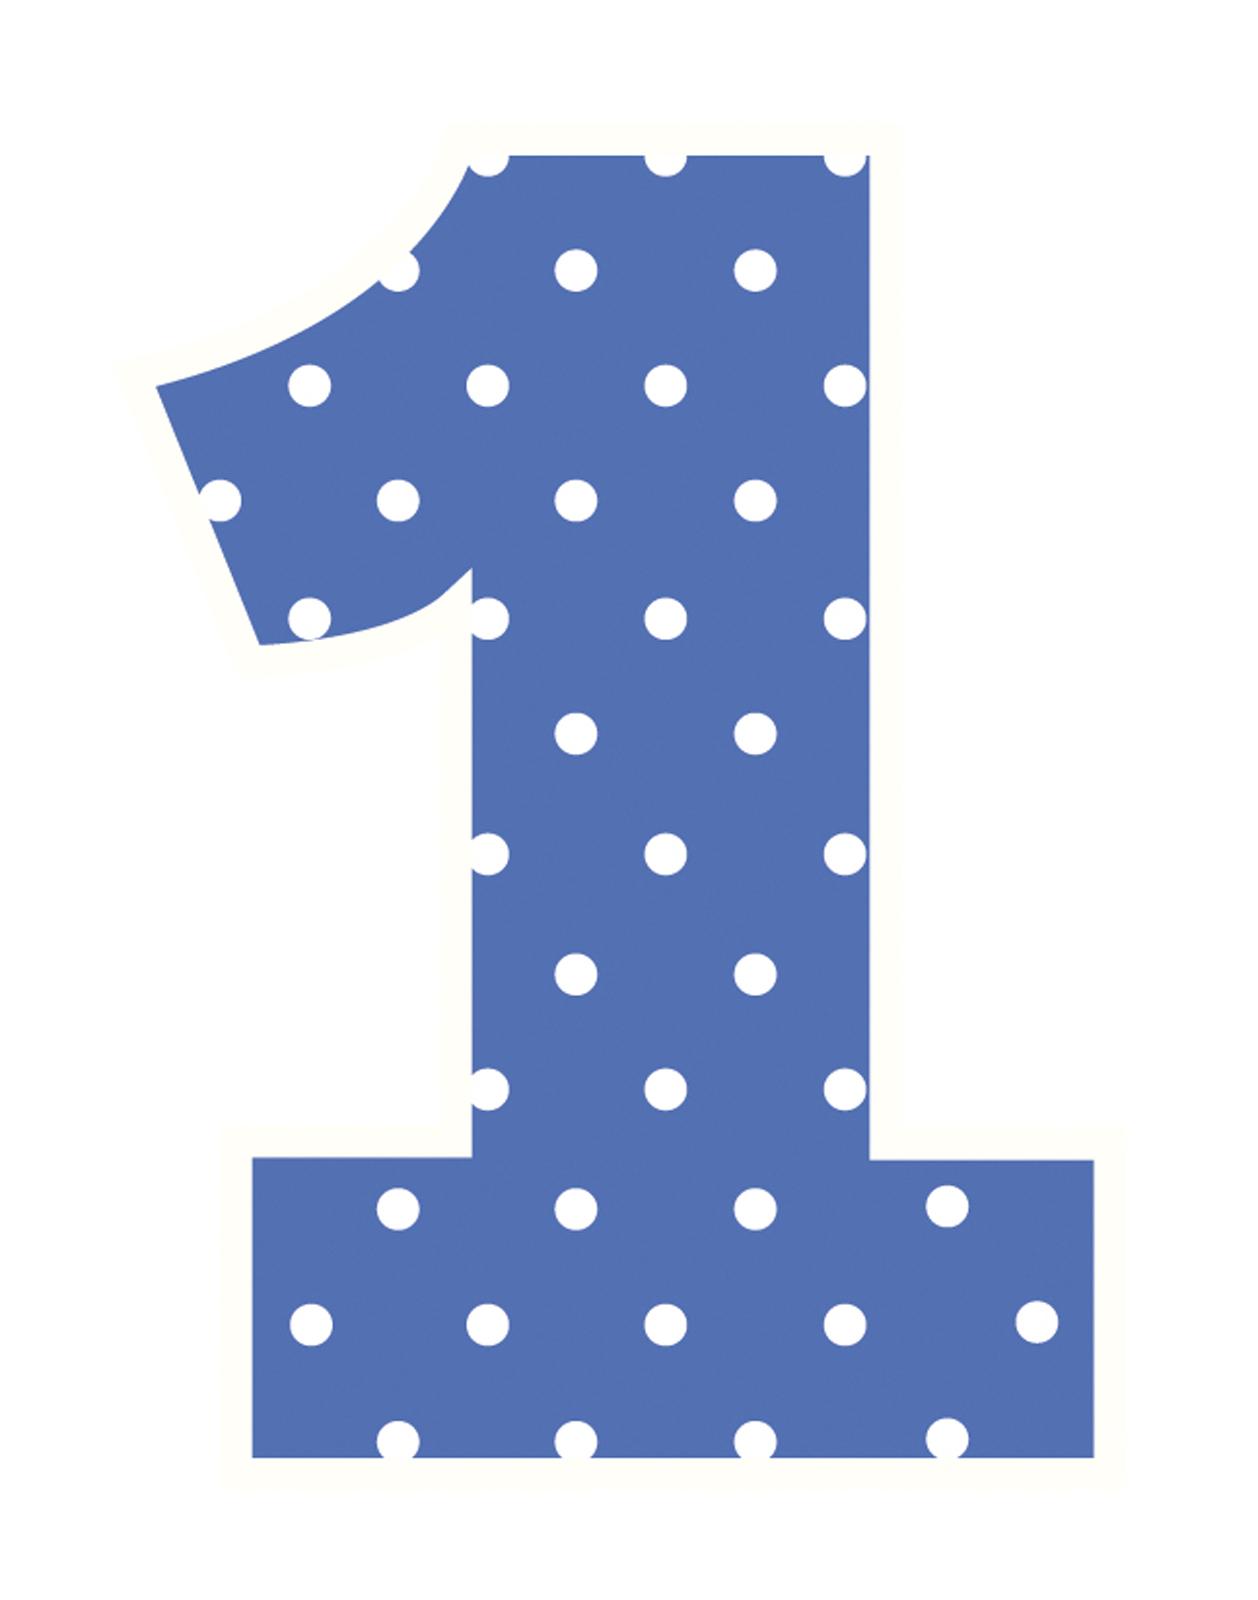 ... Number 1 Clip Art At Clker Com Vector Clip Art Online Royalty Free .